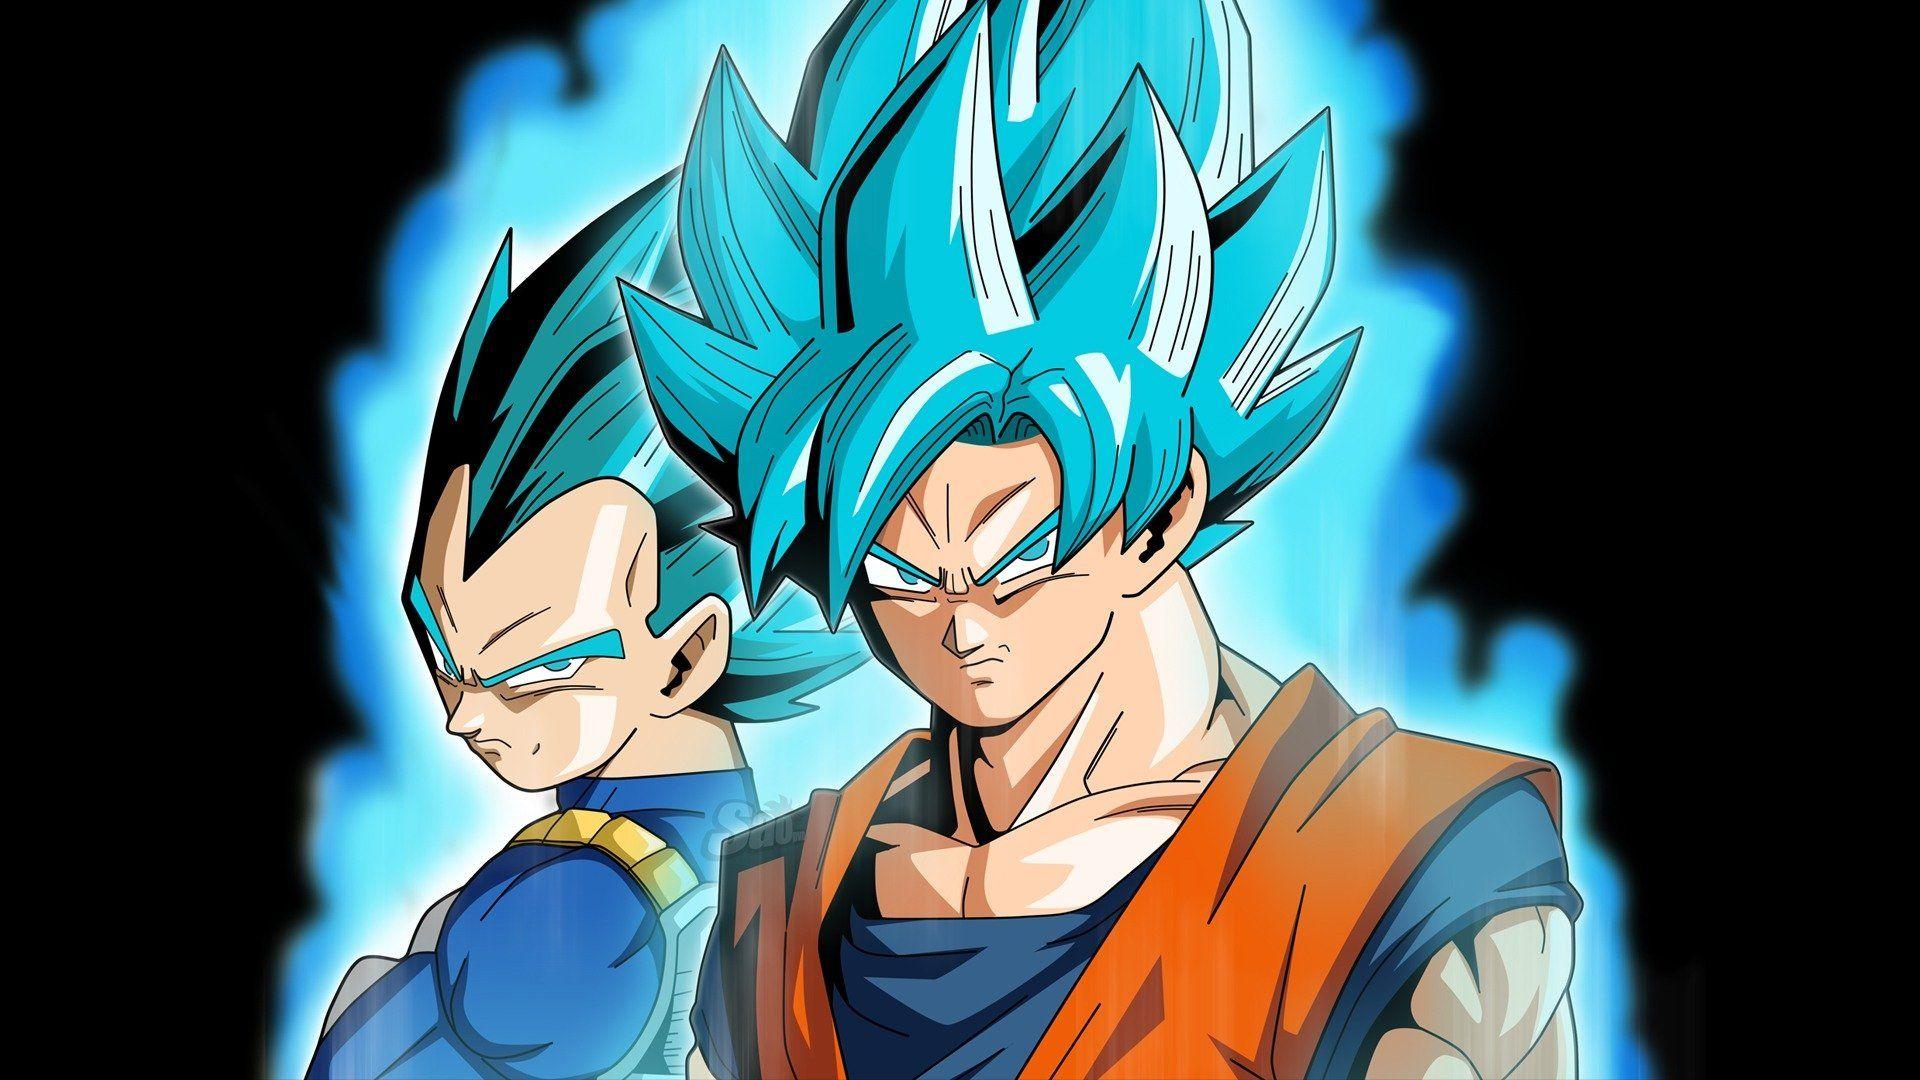 Goku And Vegeta Full Hd Wallpaper And Background Image Dragon Ball Super Goku And Vegeta Blue 1920x1080 Download Hd Wallpaper Wallpapertip